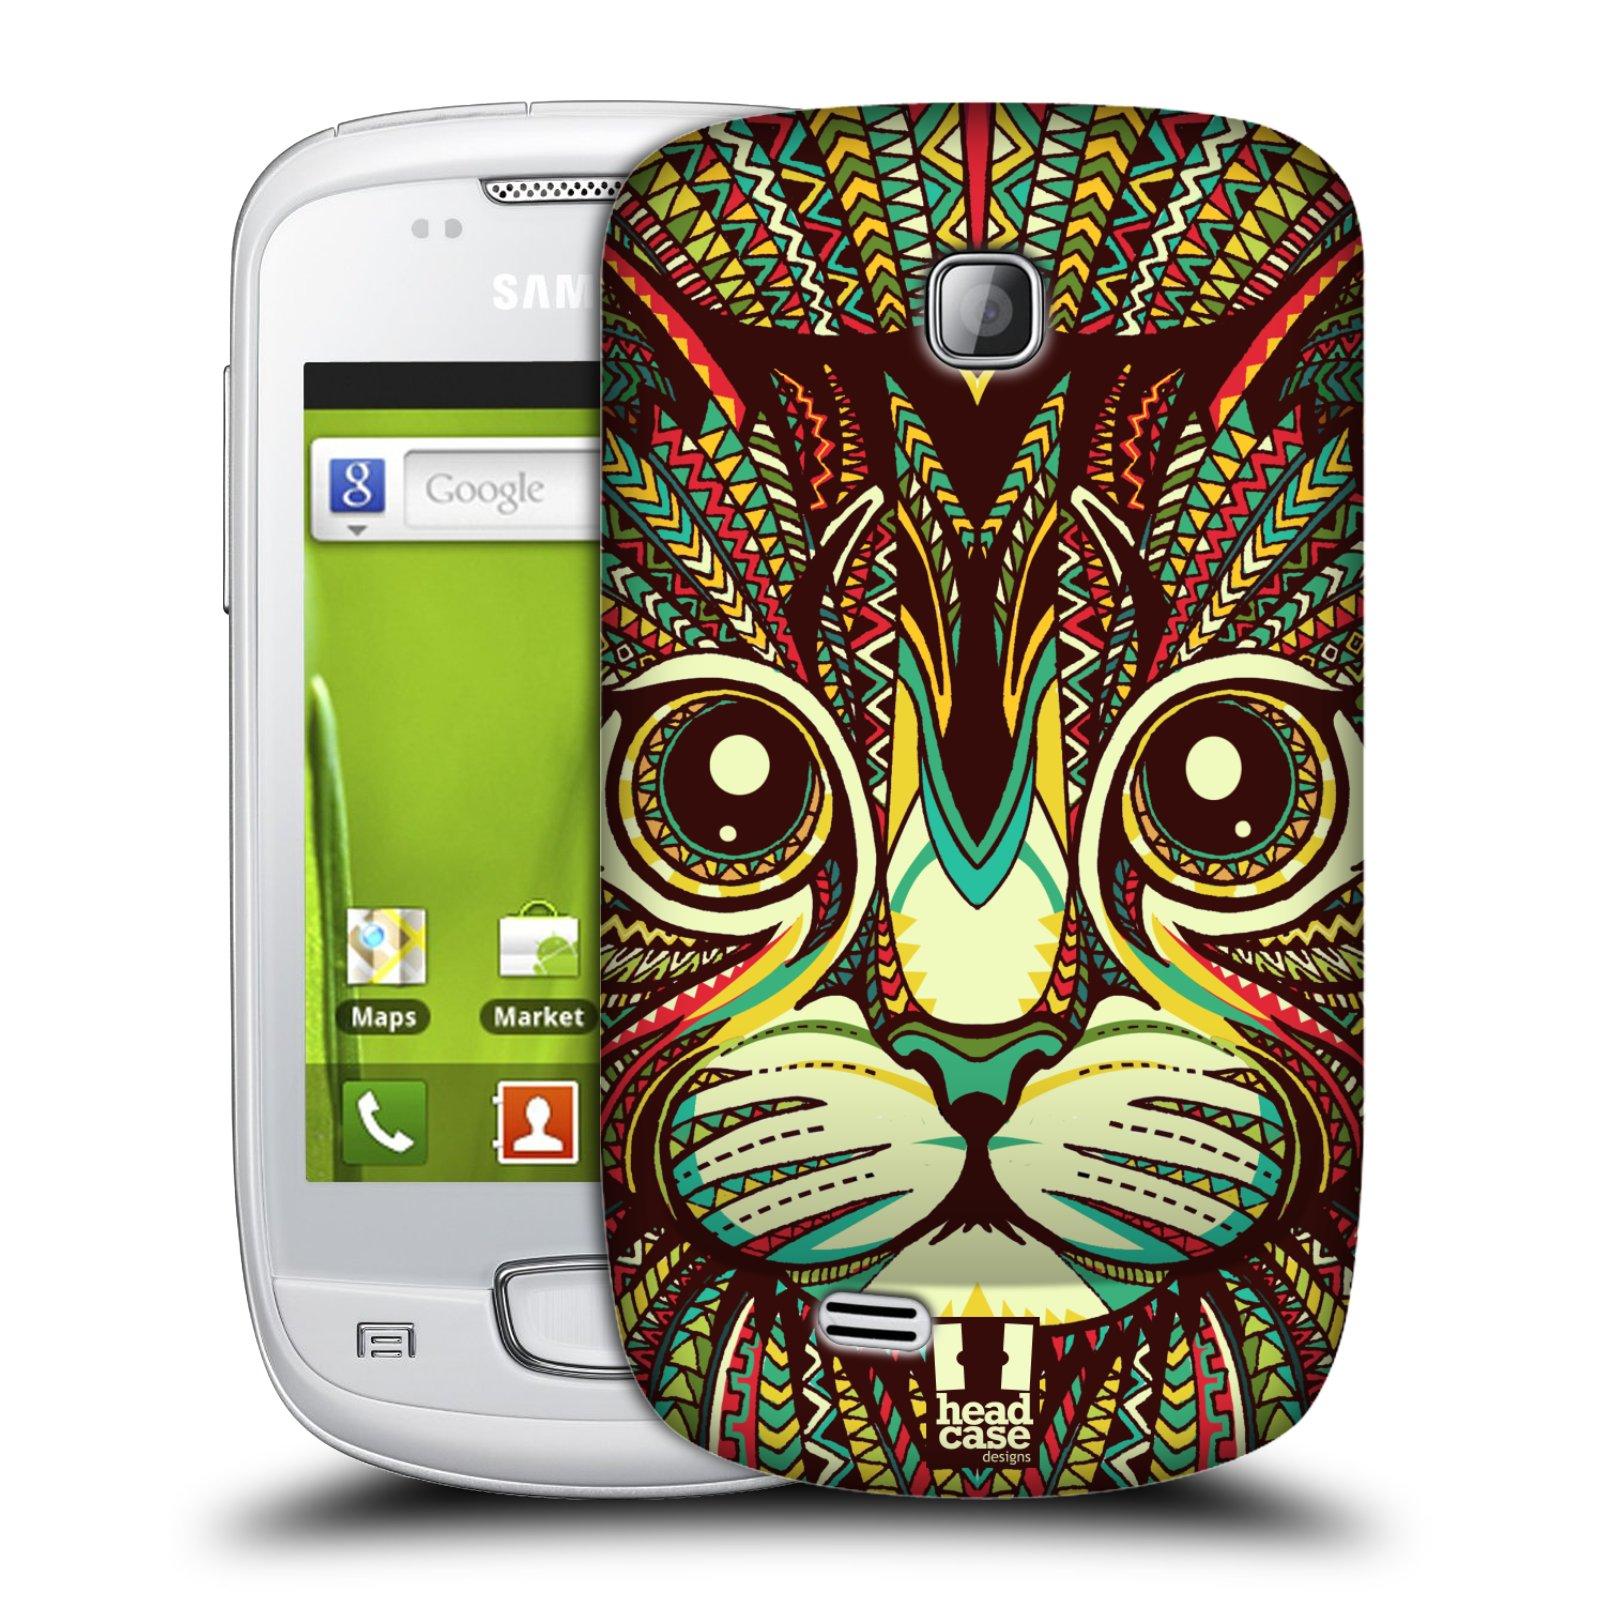 Plastové pouzdro na mobil Samsung Galaxy Mini HEAD CASE AZTEC KOČKA (Kryt či obal na mobilní telefon Samsung Galaxy Mini GT-S5570 / GT-S5570i)